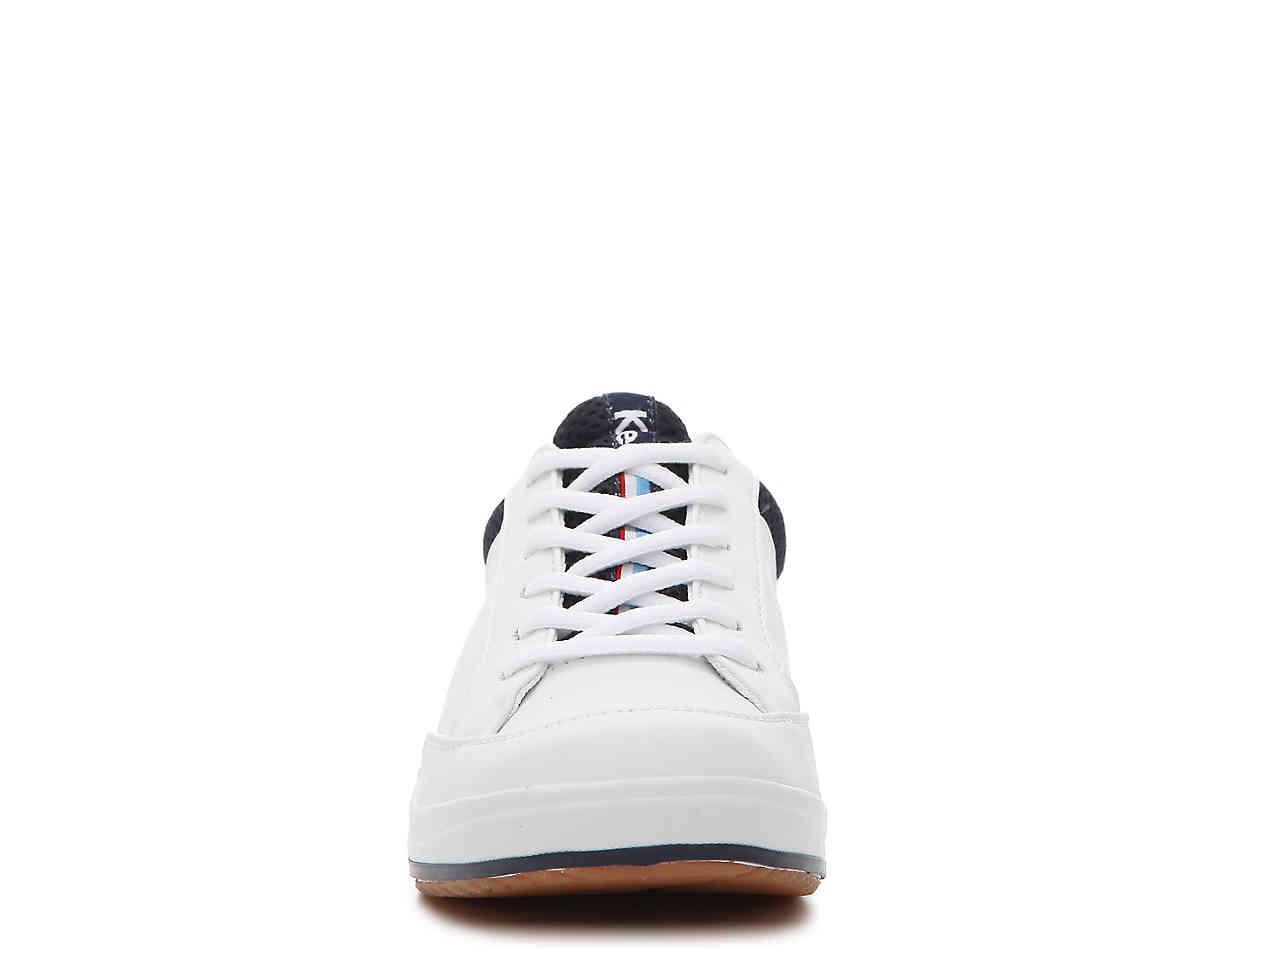 Keds Leather Rebellion Sneaker in White